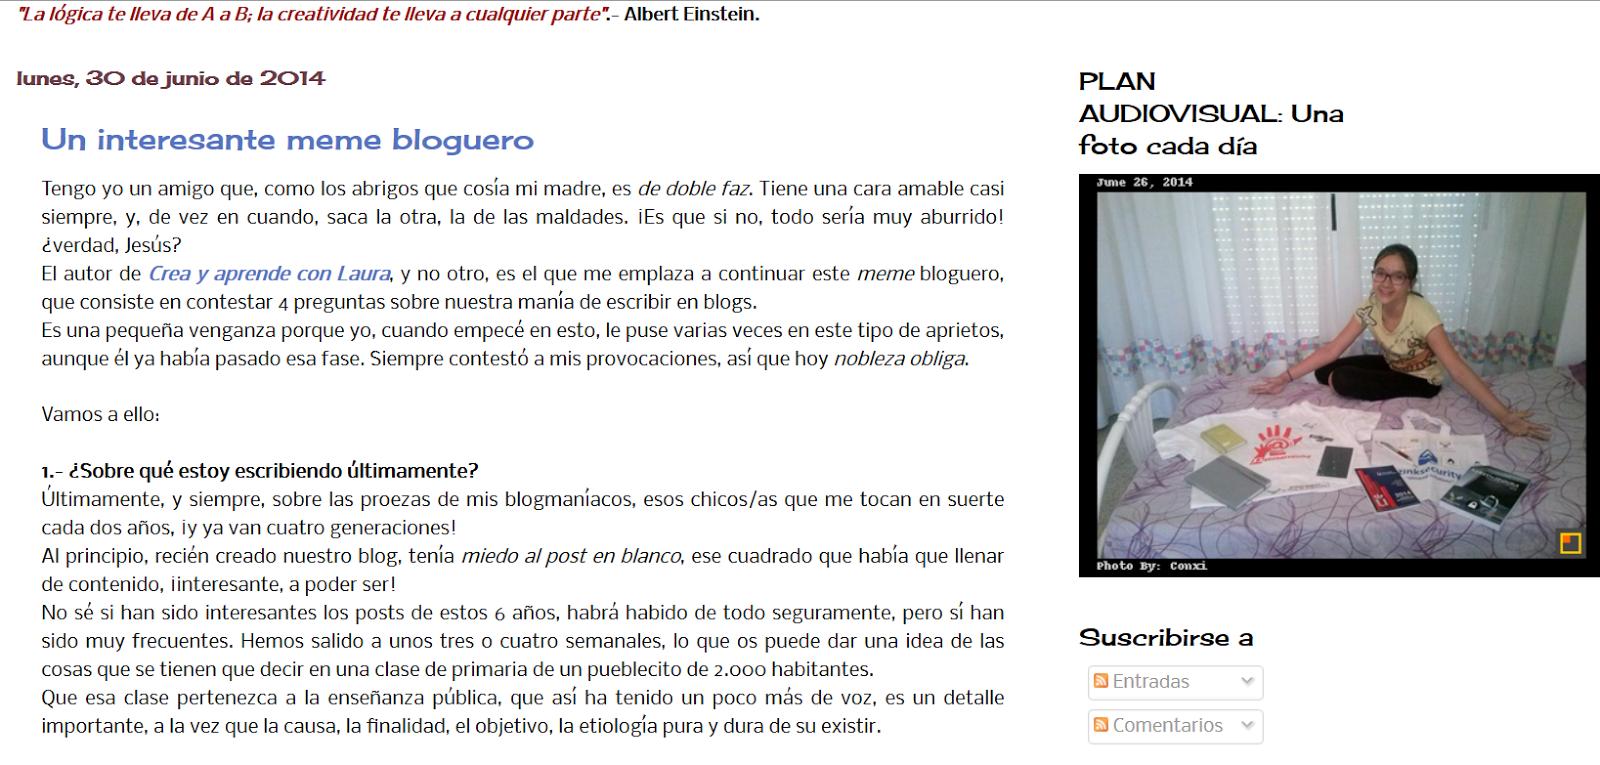 http://blogmaniacosunidos.blogspot.com.es/2014/06/un-interesante-meme-bloguero.html